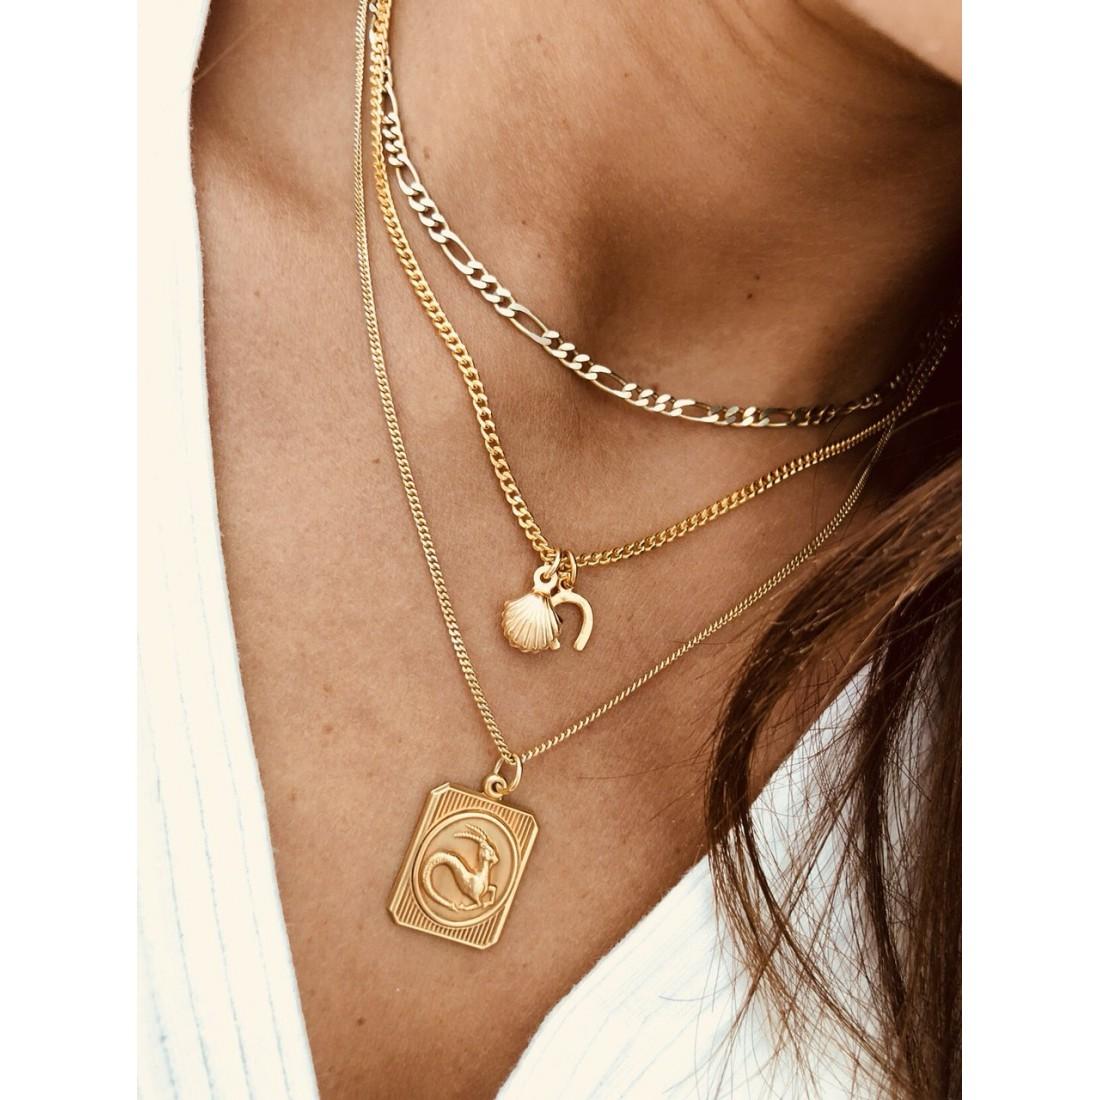 1d331e1c12 ... κολιέ κρεμαστό ασήμι χρυσό επιχρυσωμένο πέταλο κοχύλι αλυσίδα χοντρή  vintage bantouvani